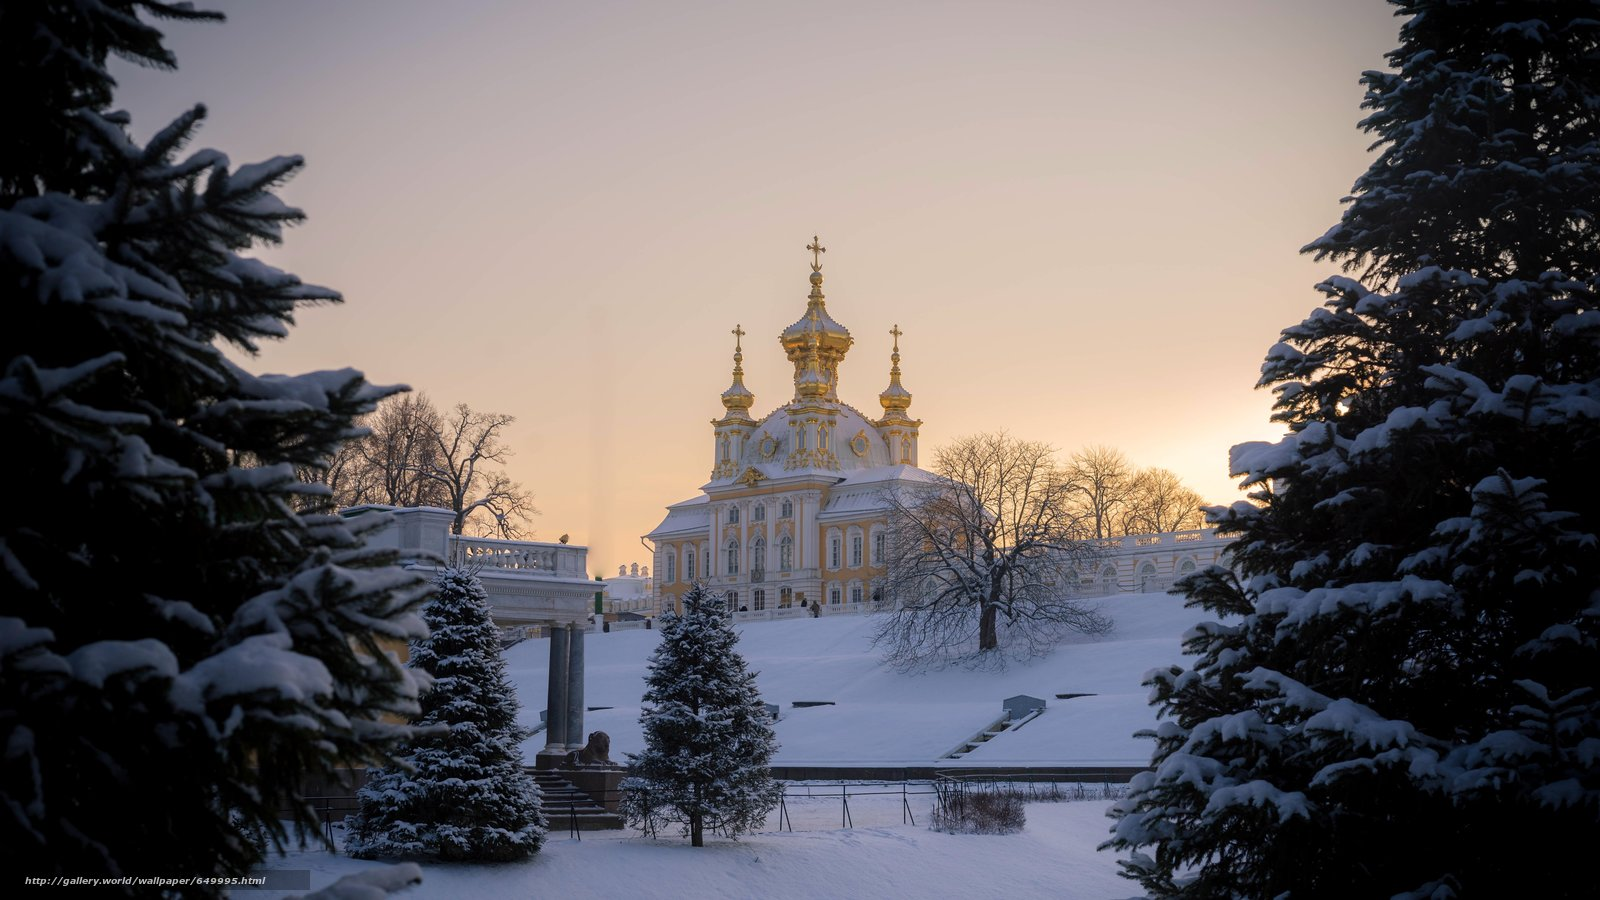 Download wallpaper Peterhof,  rise,  Russia free desktop wallpaper in the resolution 5787x3256 — picture №649995